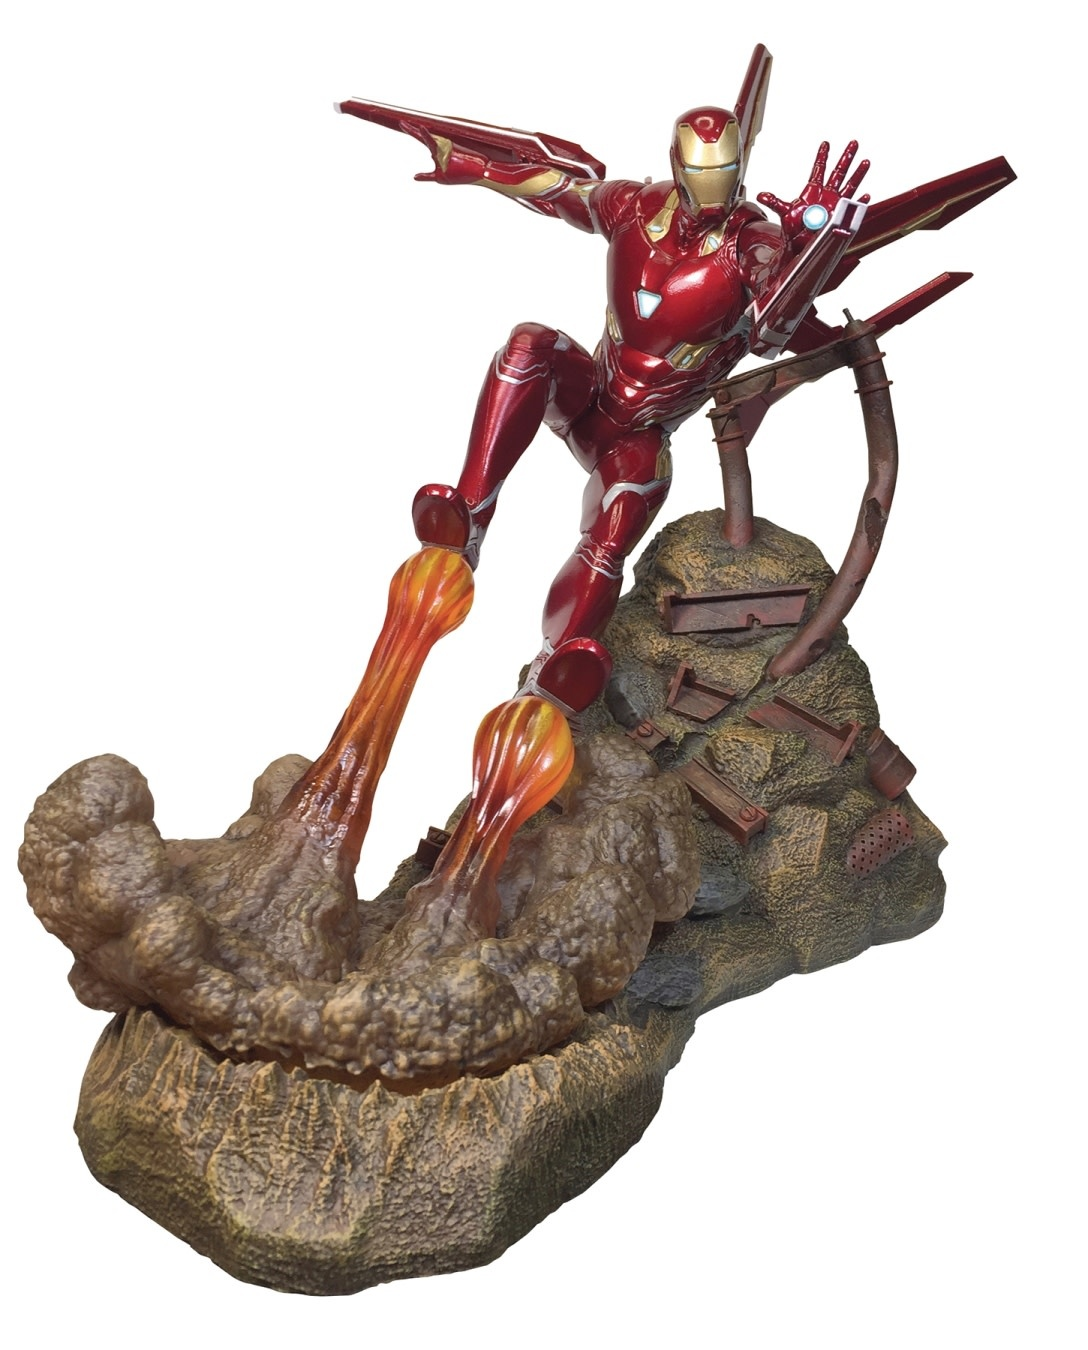 Diamond Direct Marvel Premier: Avengers 3 Iron Man Mk50 Statue